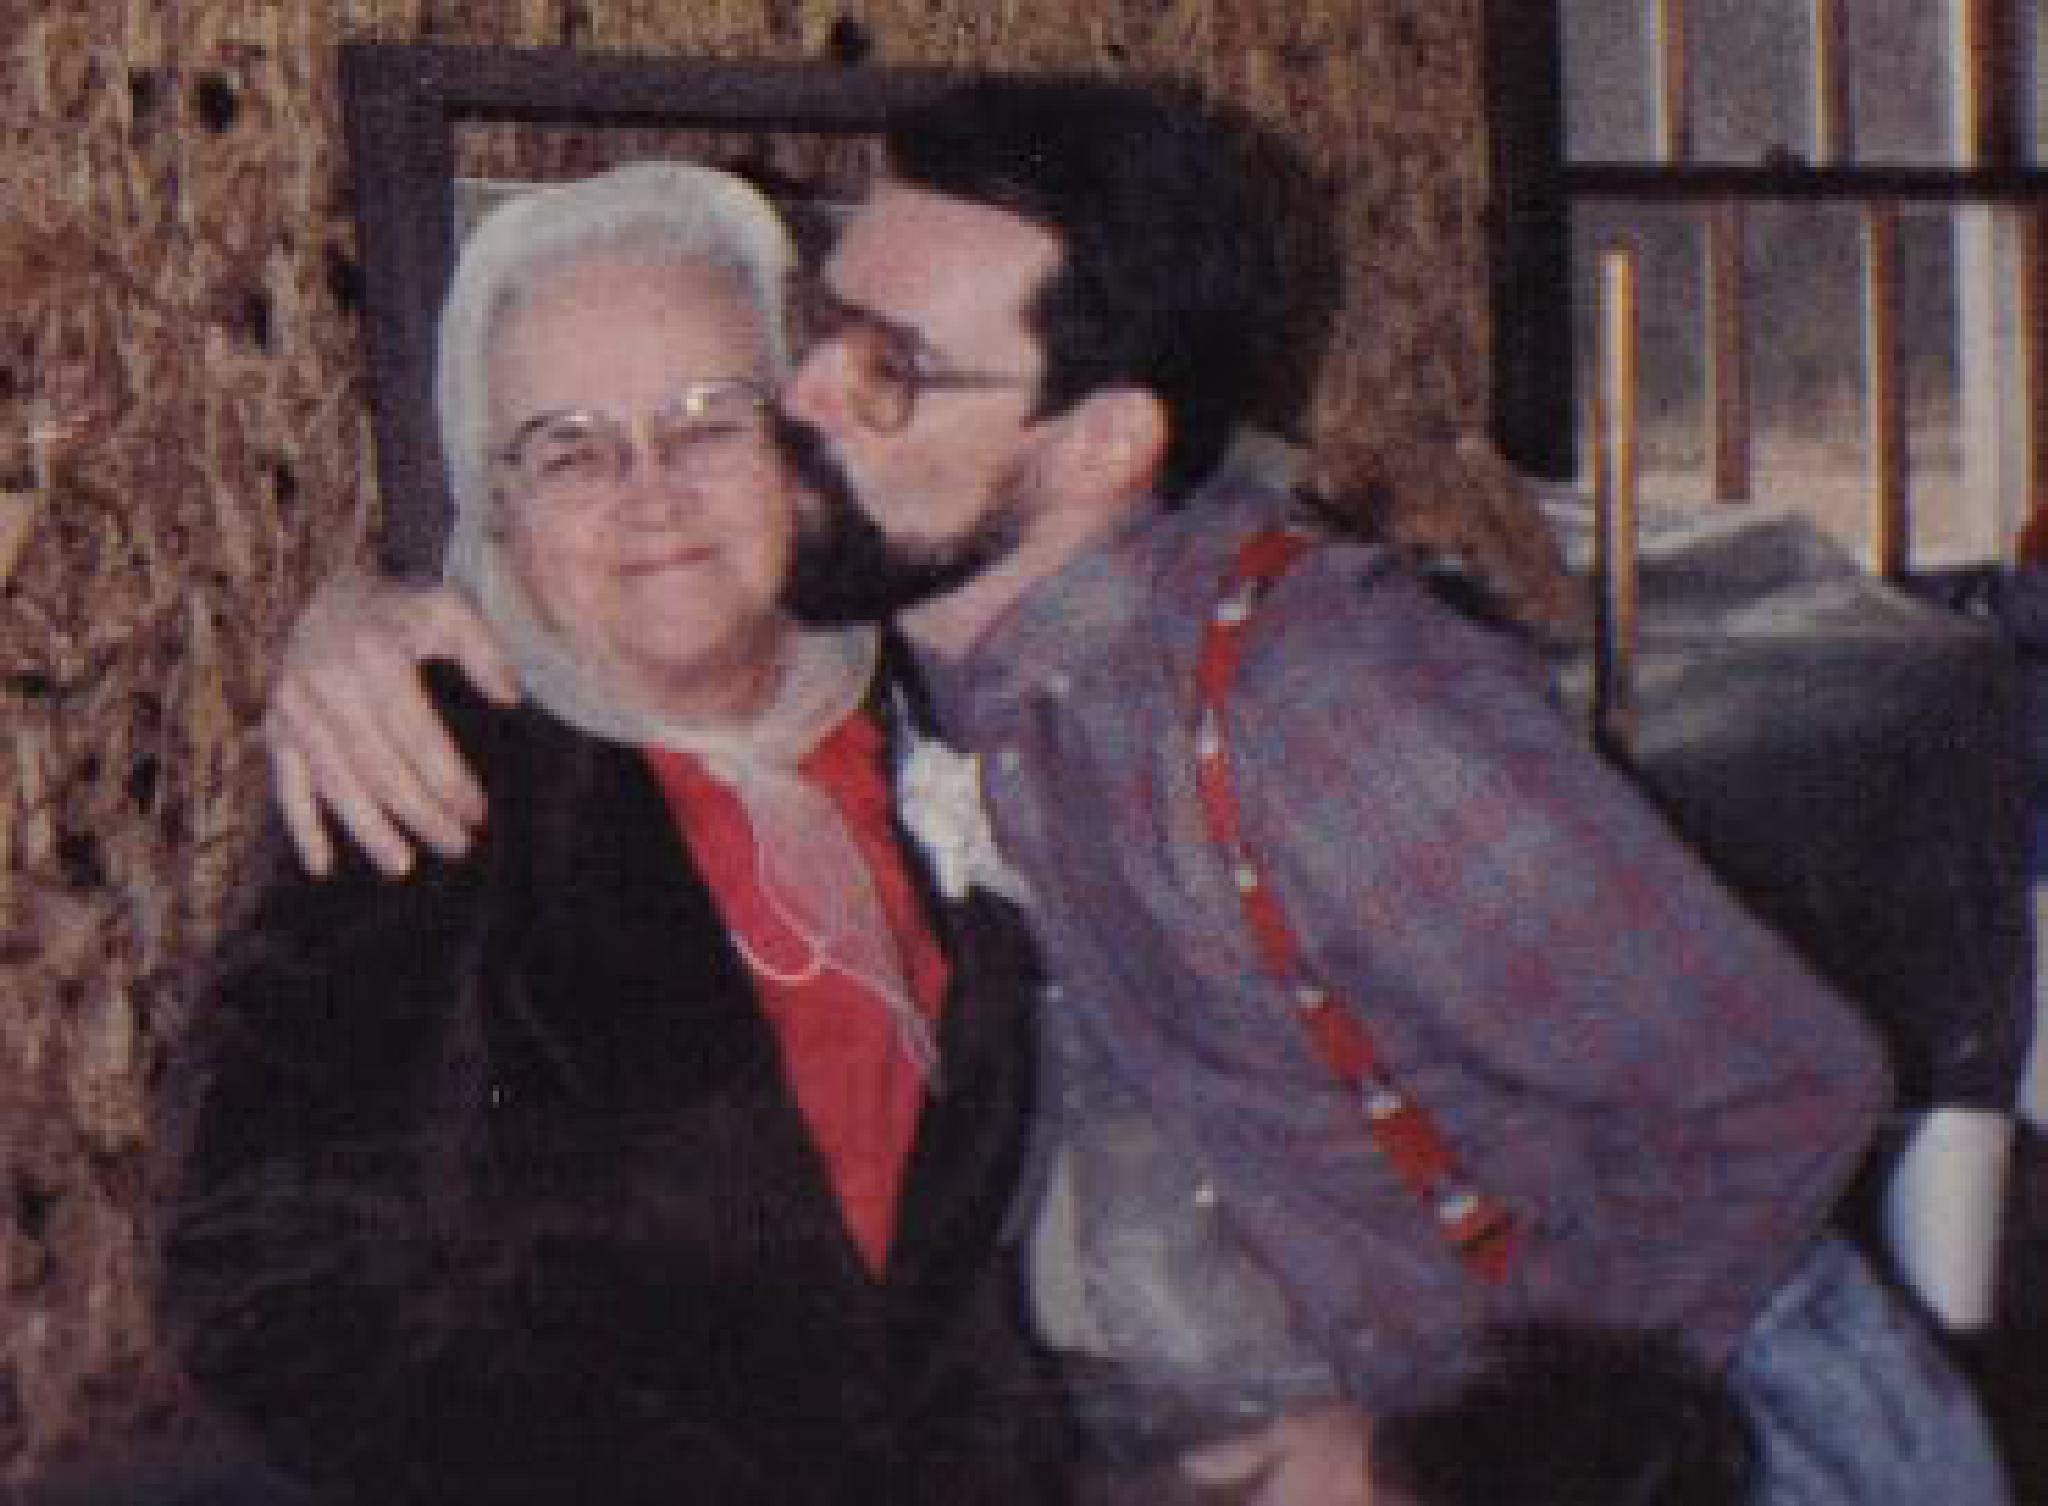 Grandma and Bruce by sandragarris27